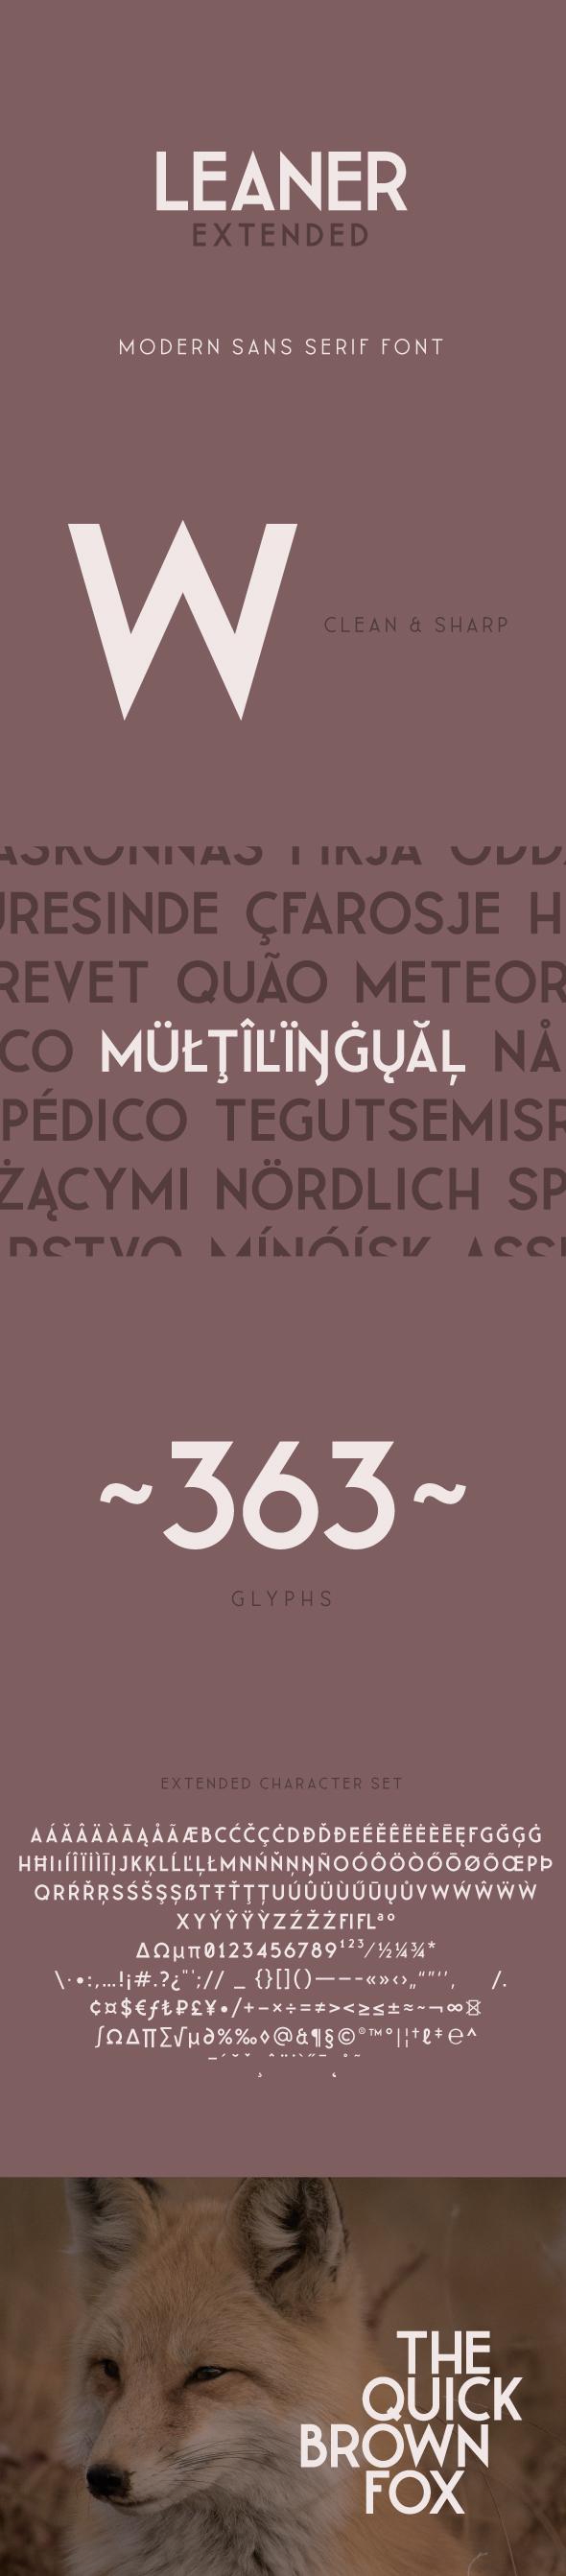 LEANER Extended -Bold - Sans-Serif Fonts